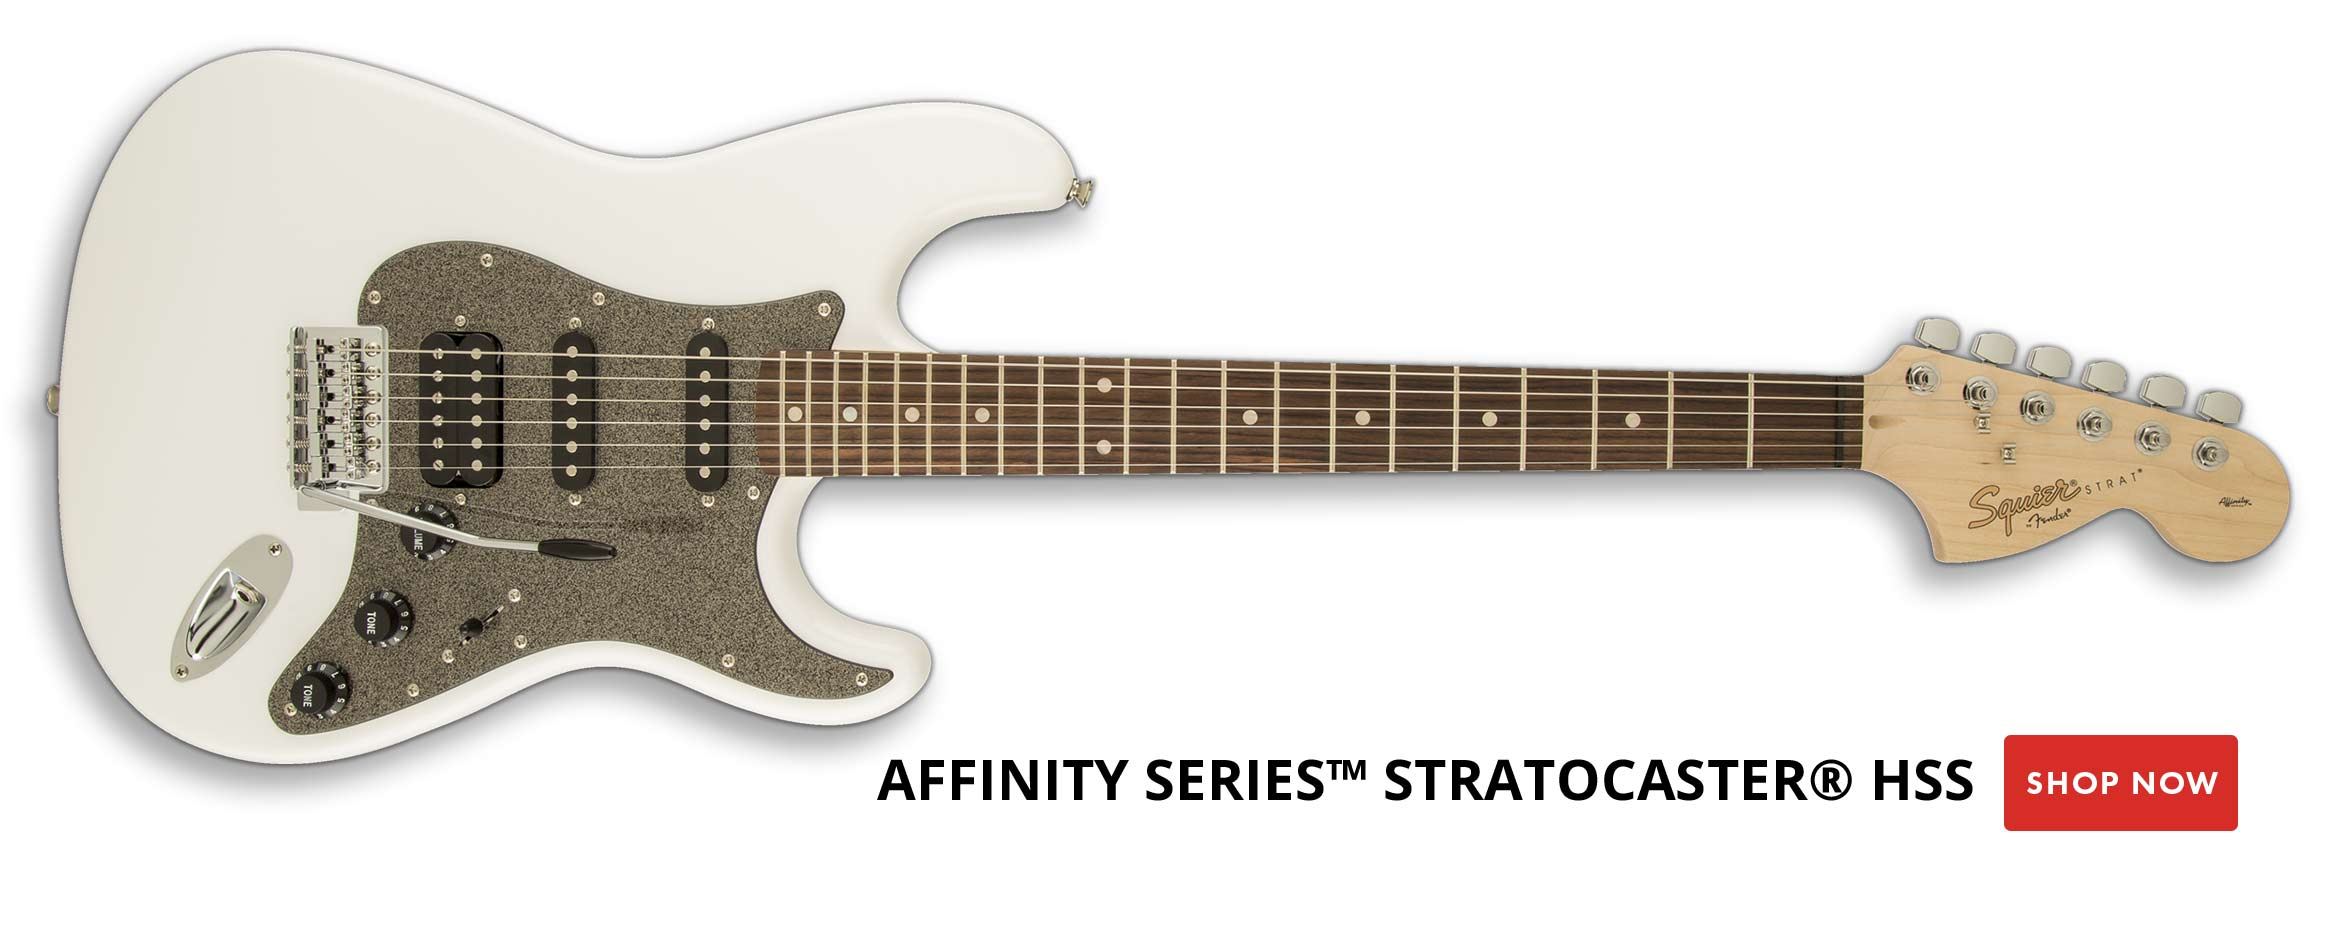 7 Electric Guitars For Beginners Fender Univox Guitar Wiring Schematics